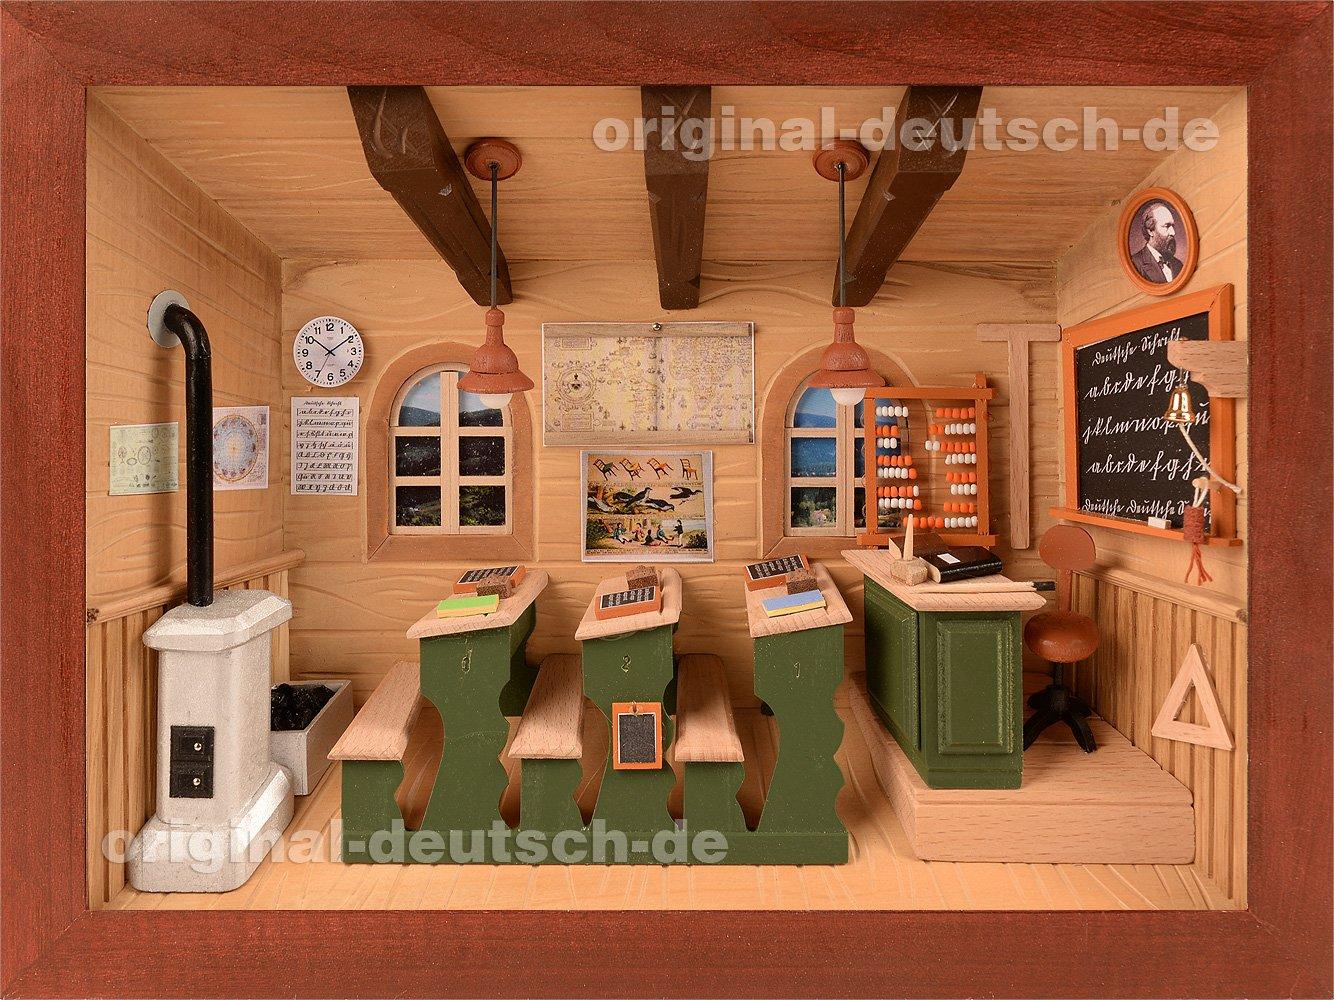 Amazon.de: 3D Holzbild Klassenzimmer, lasiert - Geschenk für Lehrer ...